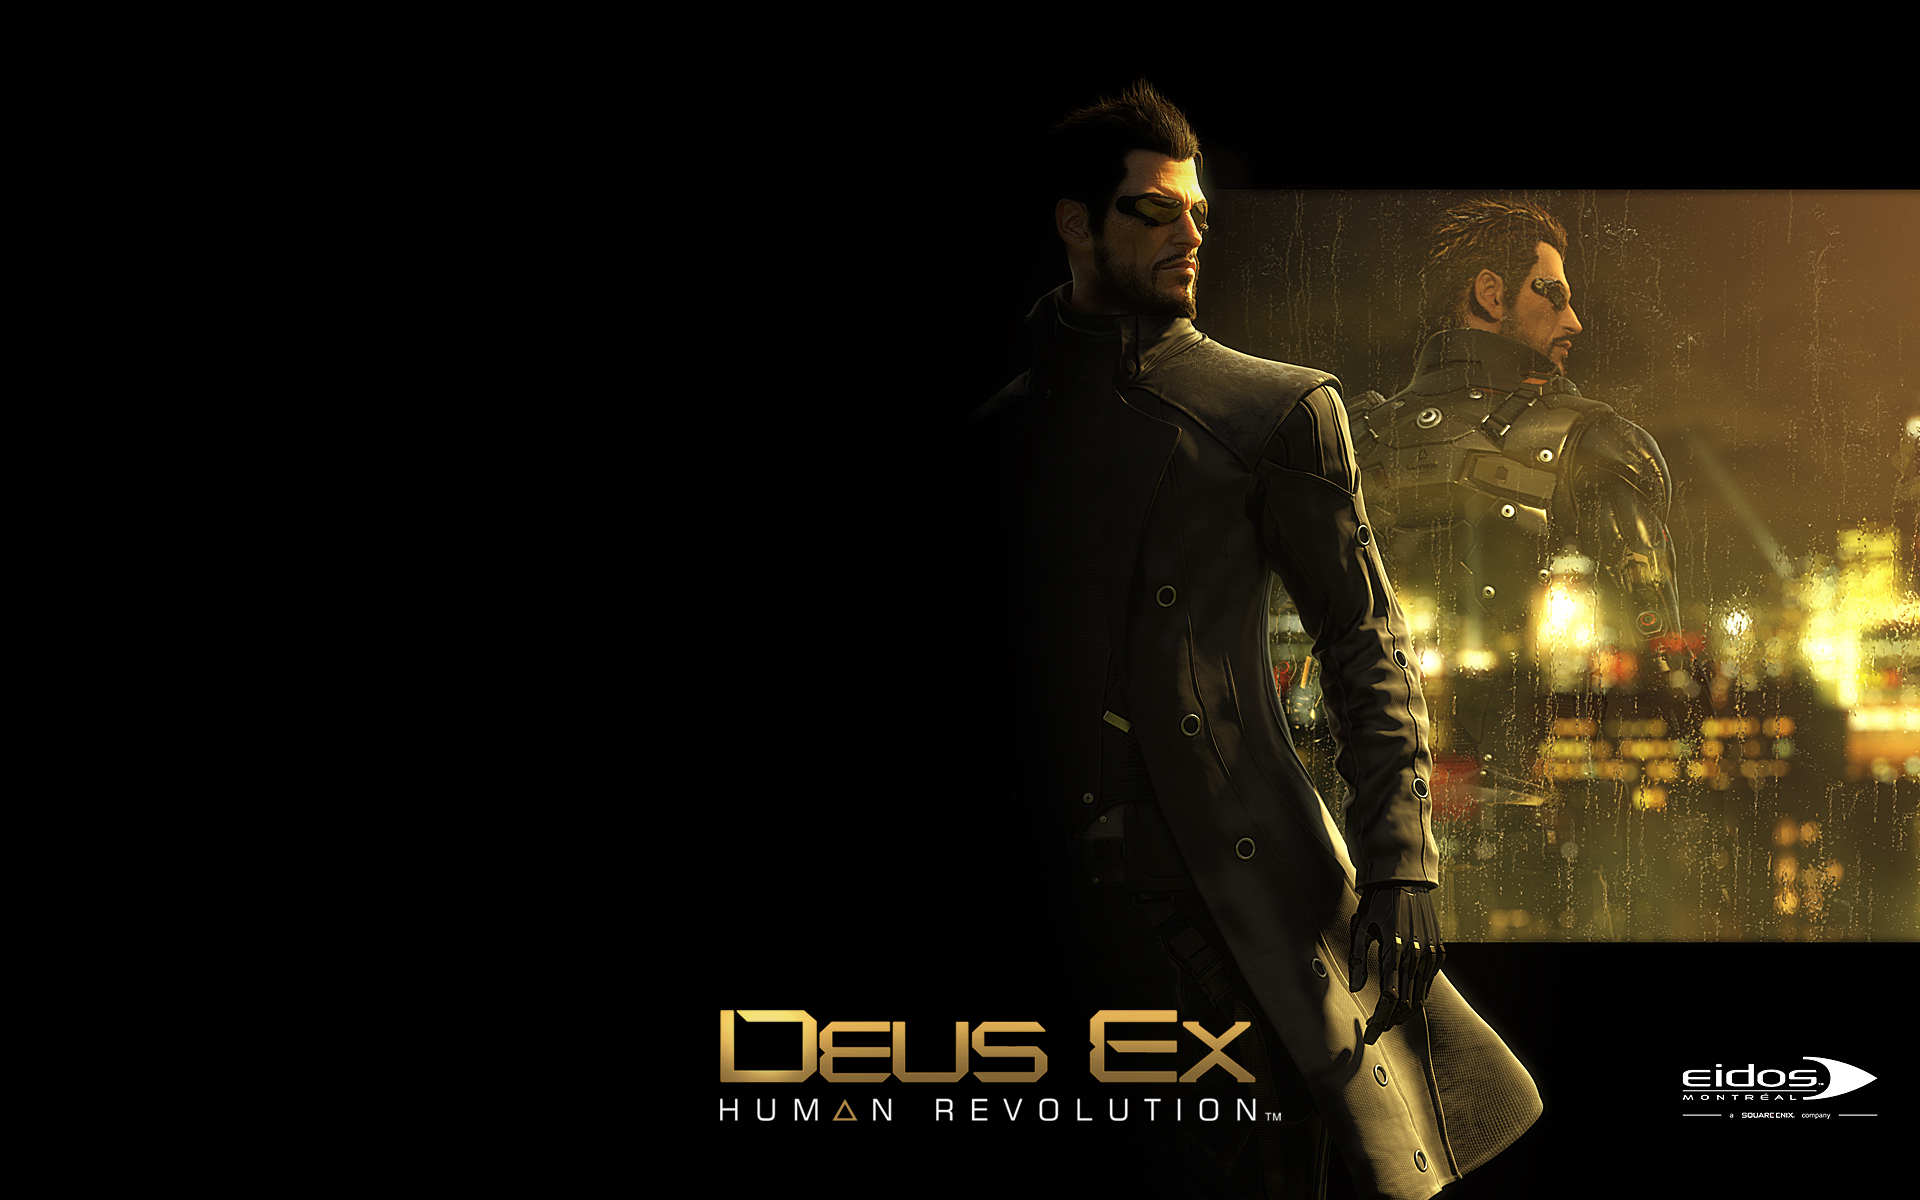 Deus Ex Human Revolution Wallpapers   HQ Wallpapers   HQ Wallpapers 1920x1200